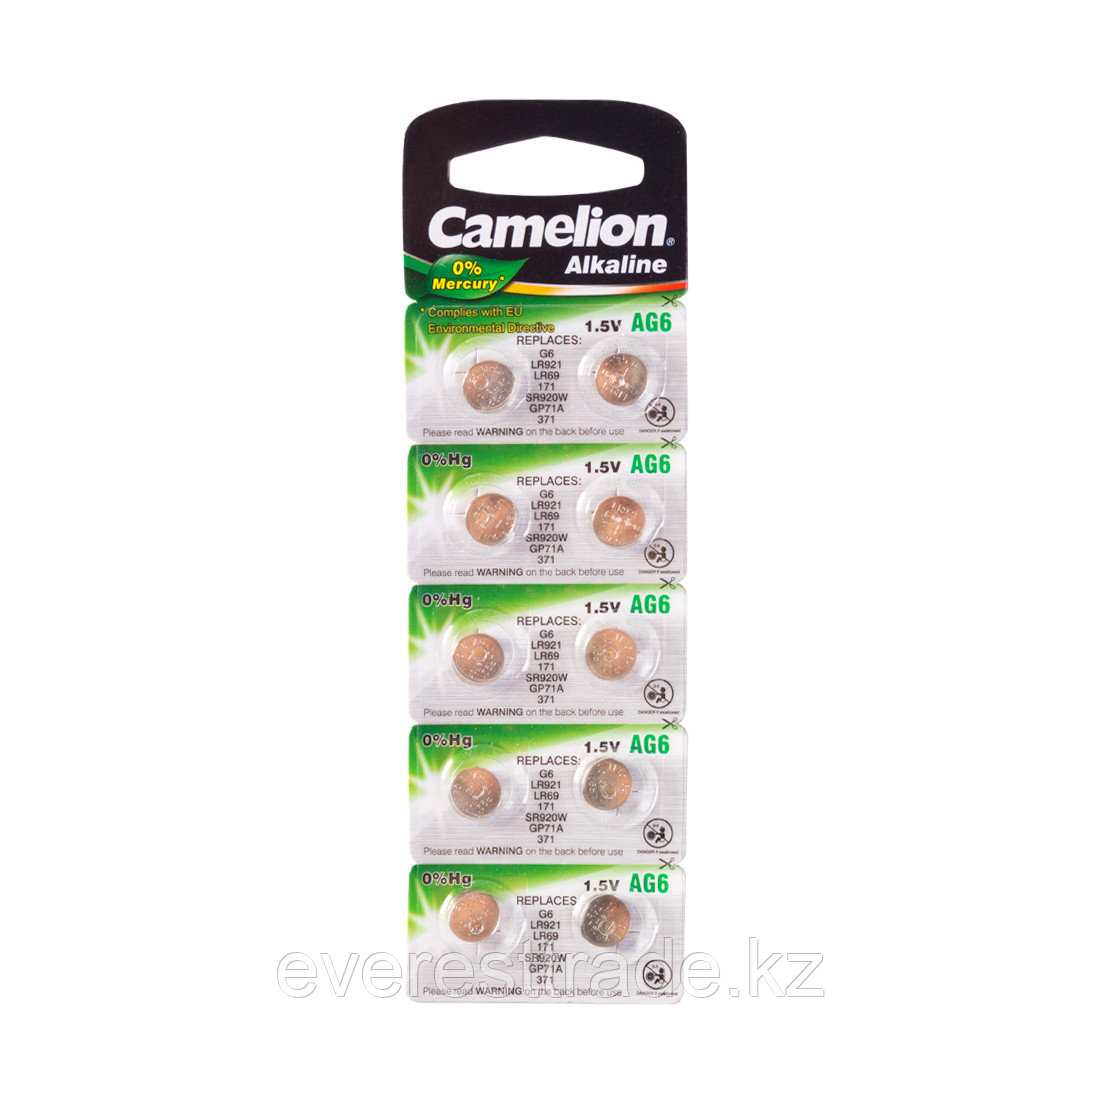 Camelion Батарейки, CAMELION, AG6-BP10, Alkaline, AG6, 1.5V, 0% Ртути, 10 шт. в блистере